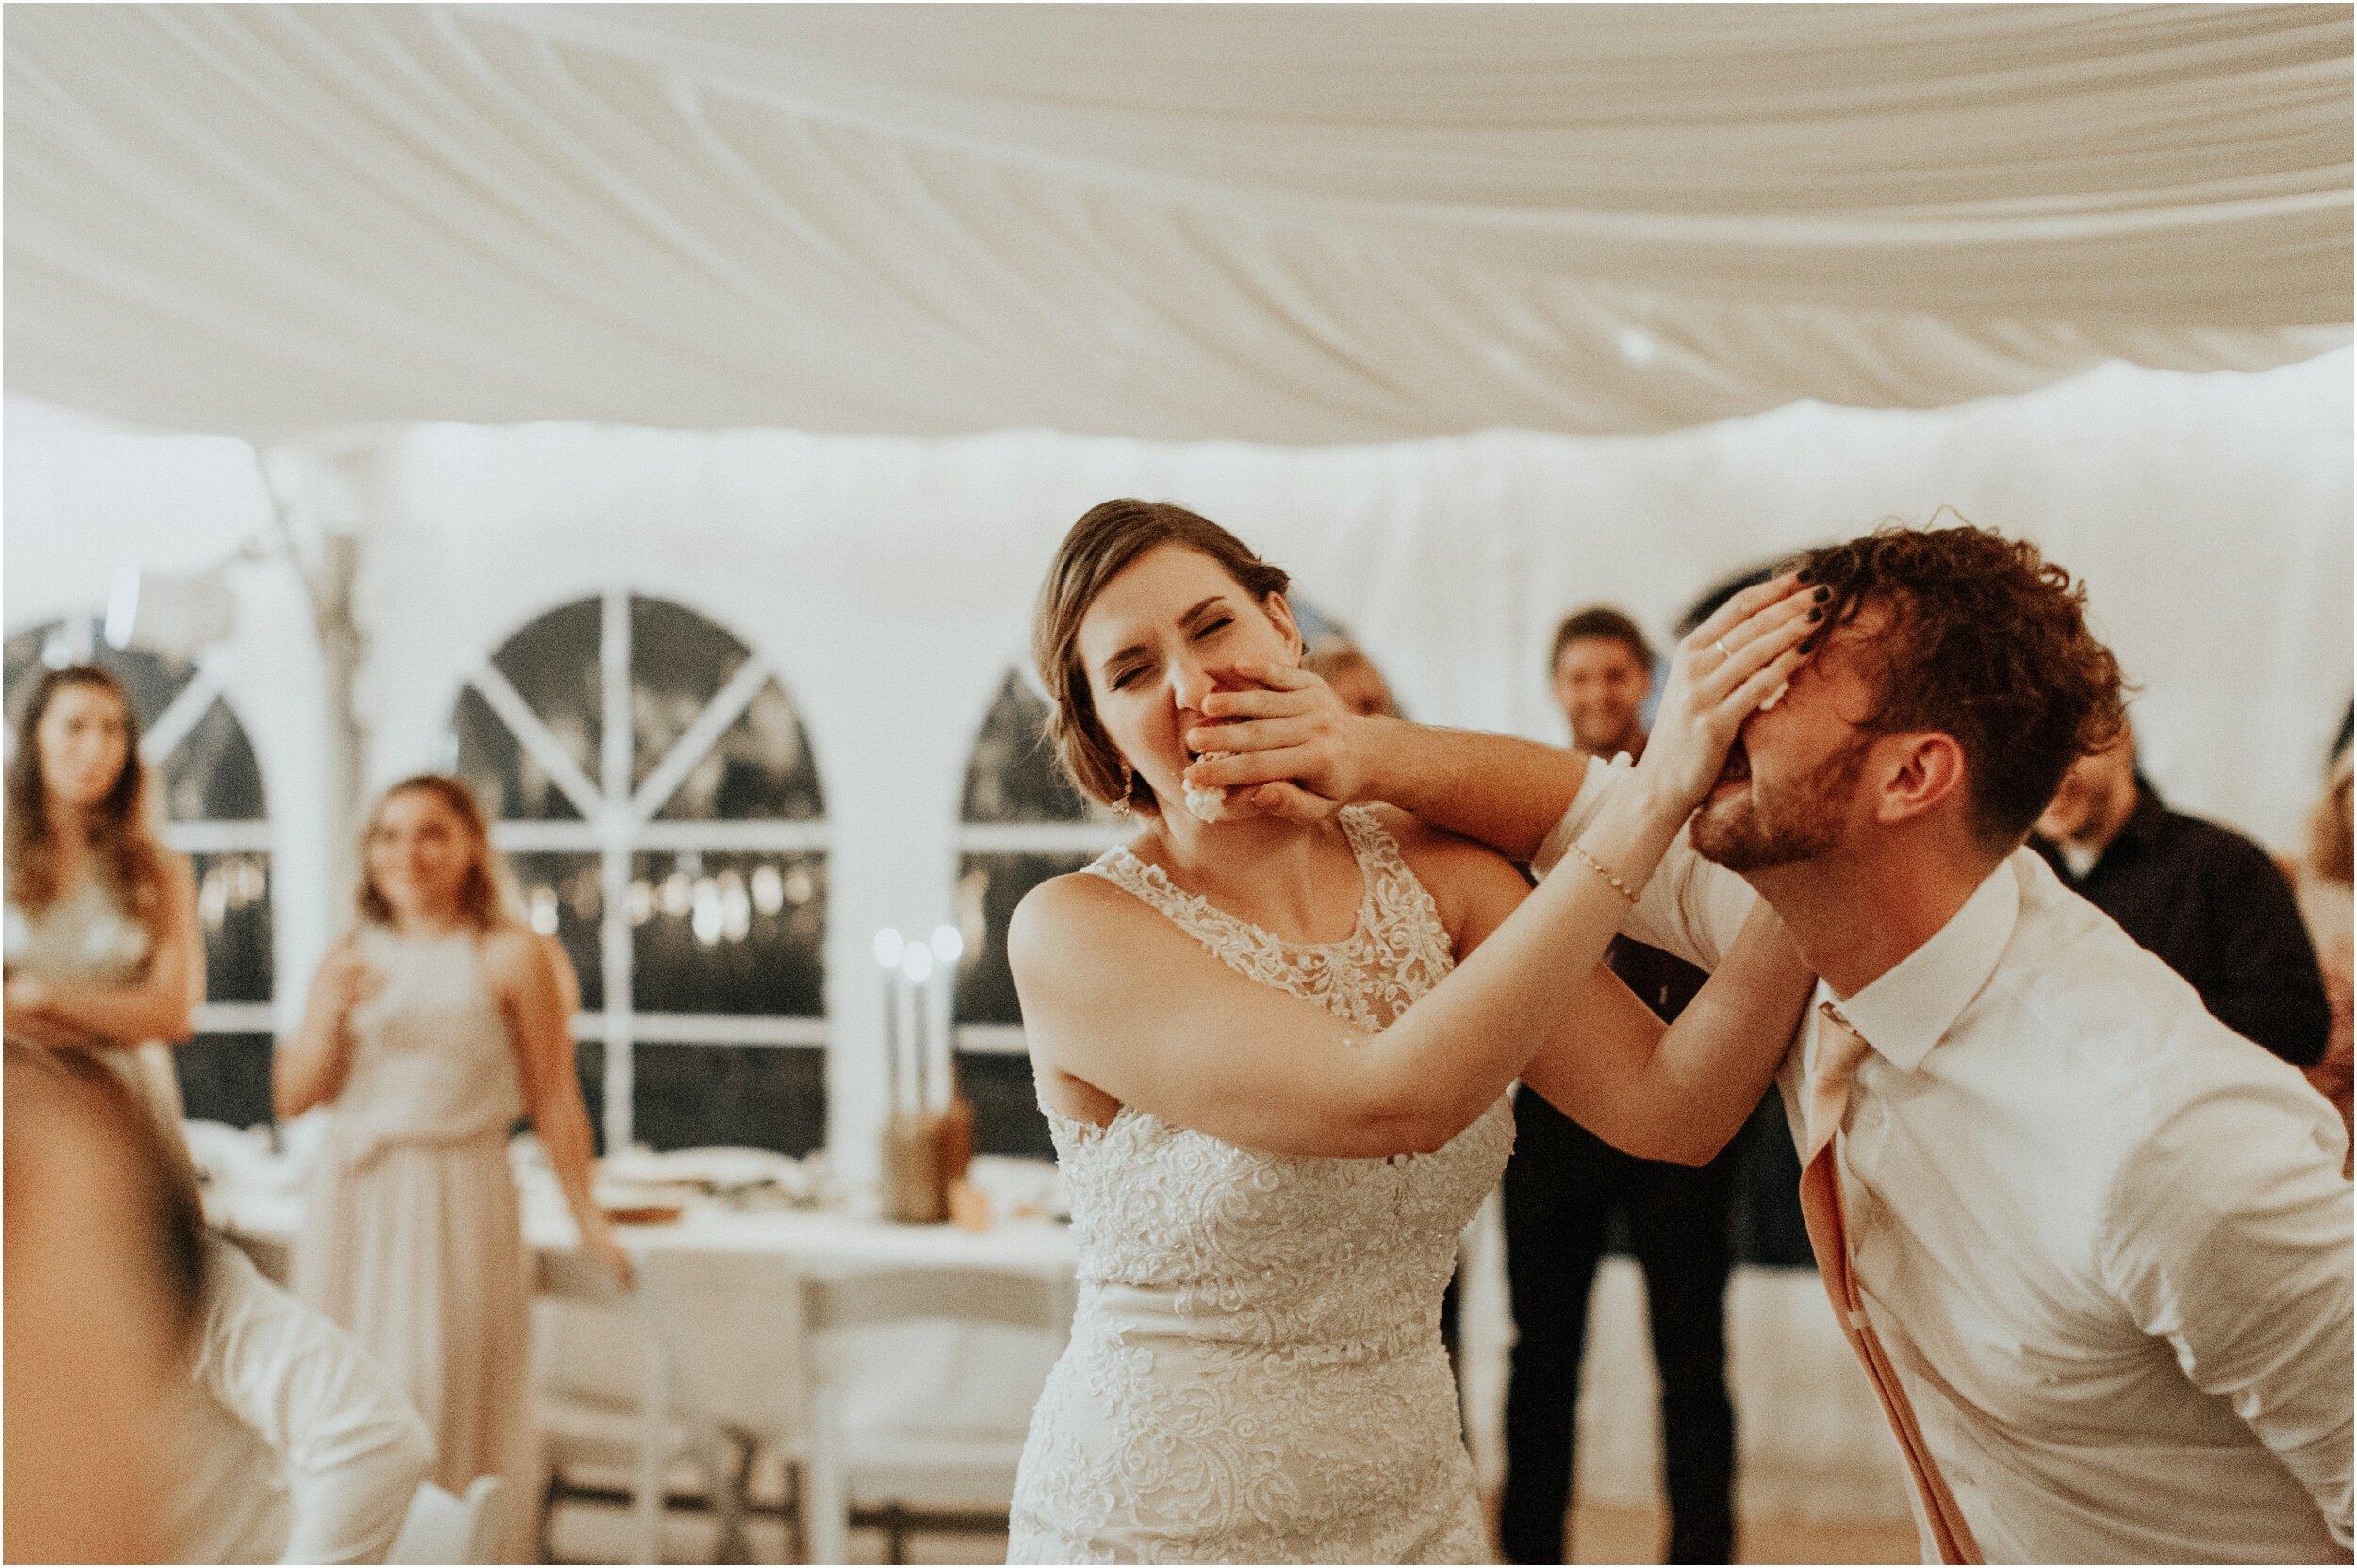 steph-and-jordan-cox-our-wedding-historic-shady-lane-compass-wedding-collective-hazel-lining-photography-destination-elopement-wedding-engagement-photography_0096.jpg